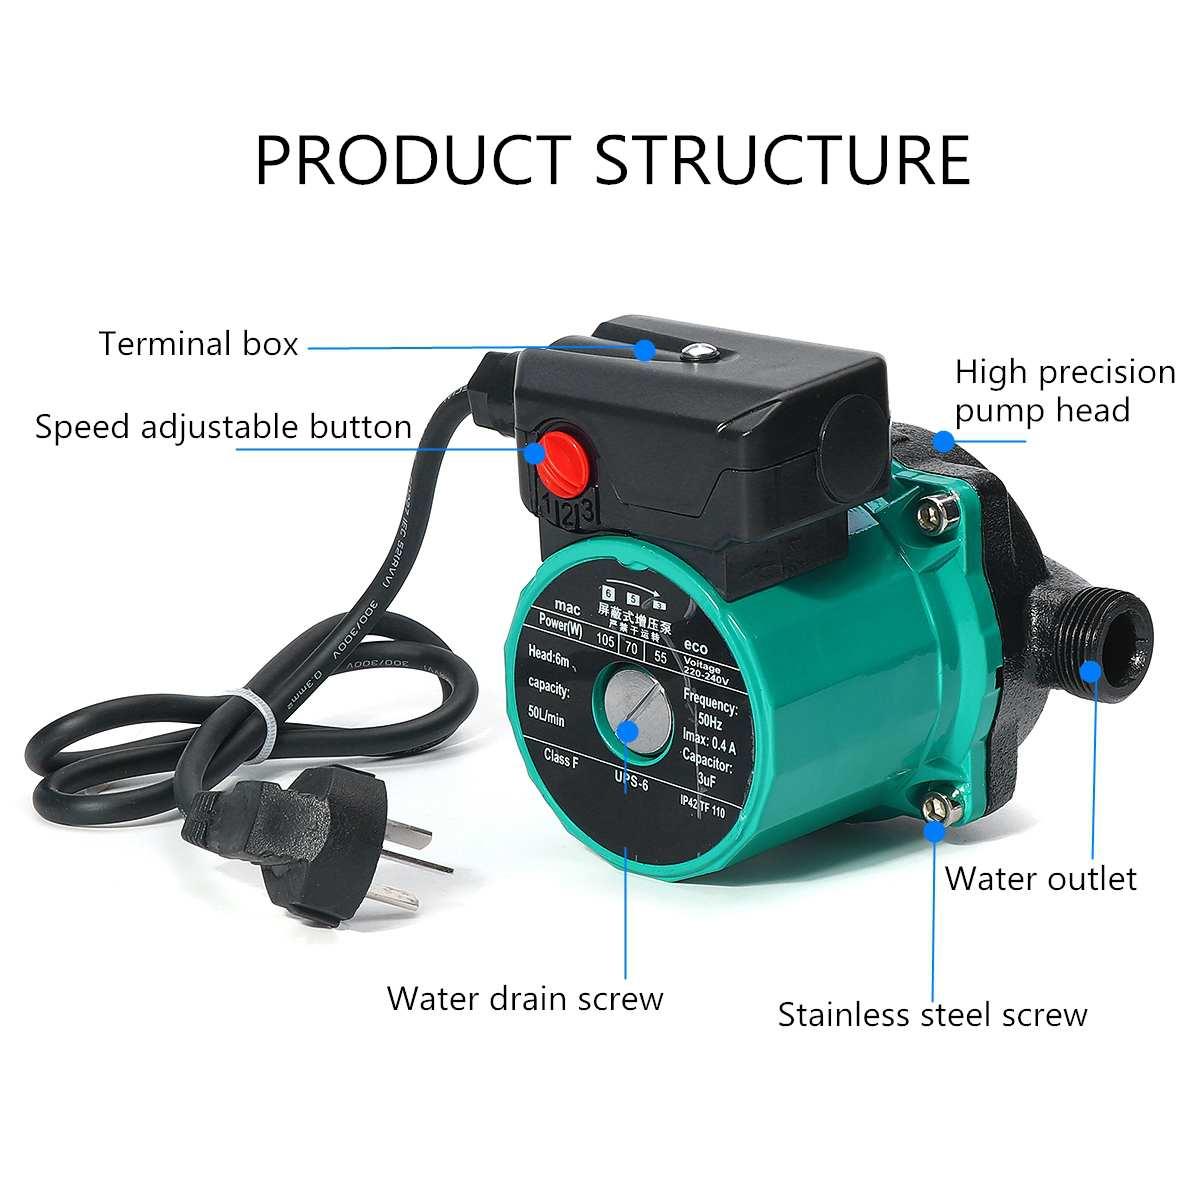 100w 3-speed Booster-Pump Circulation Circulating Pump Hot Water Circulation Pump For Heater System Booster-Pump Circulation